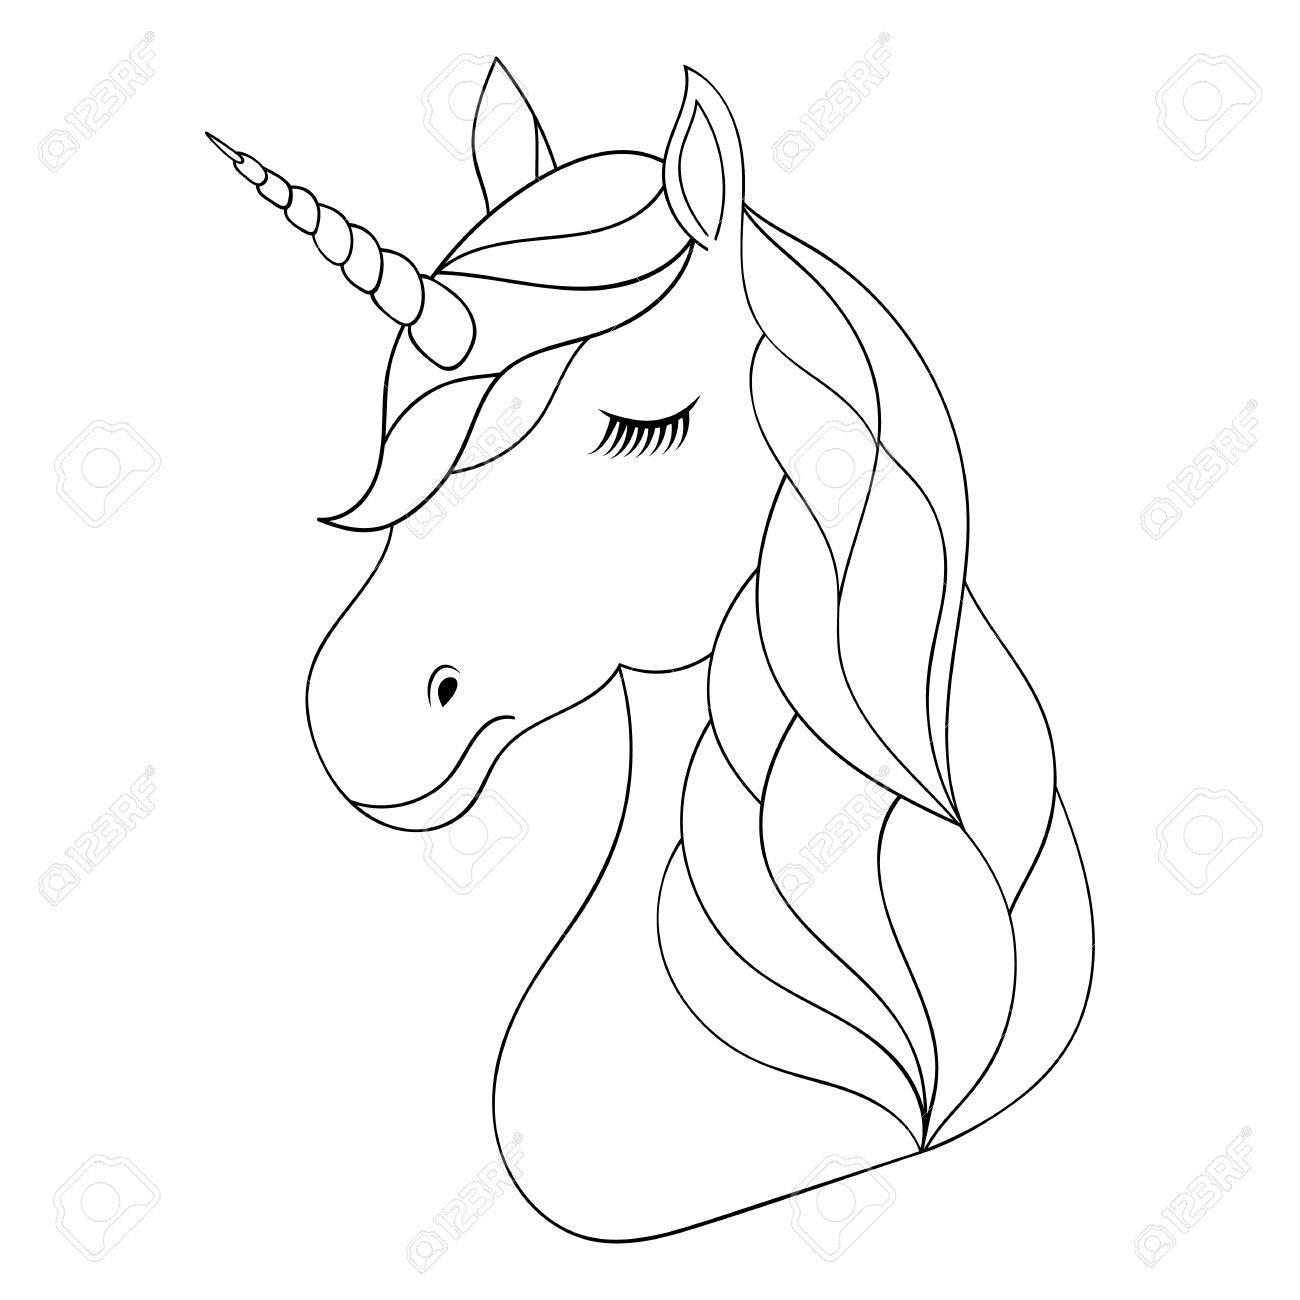 Unicorn Head Drawing At Getdrawings